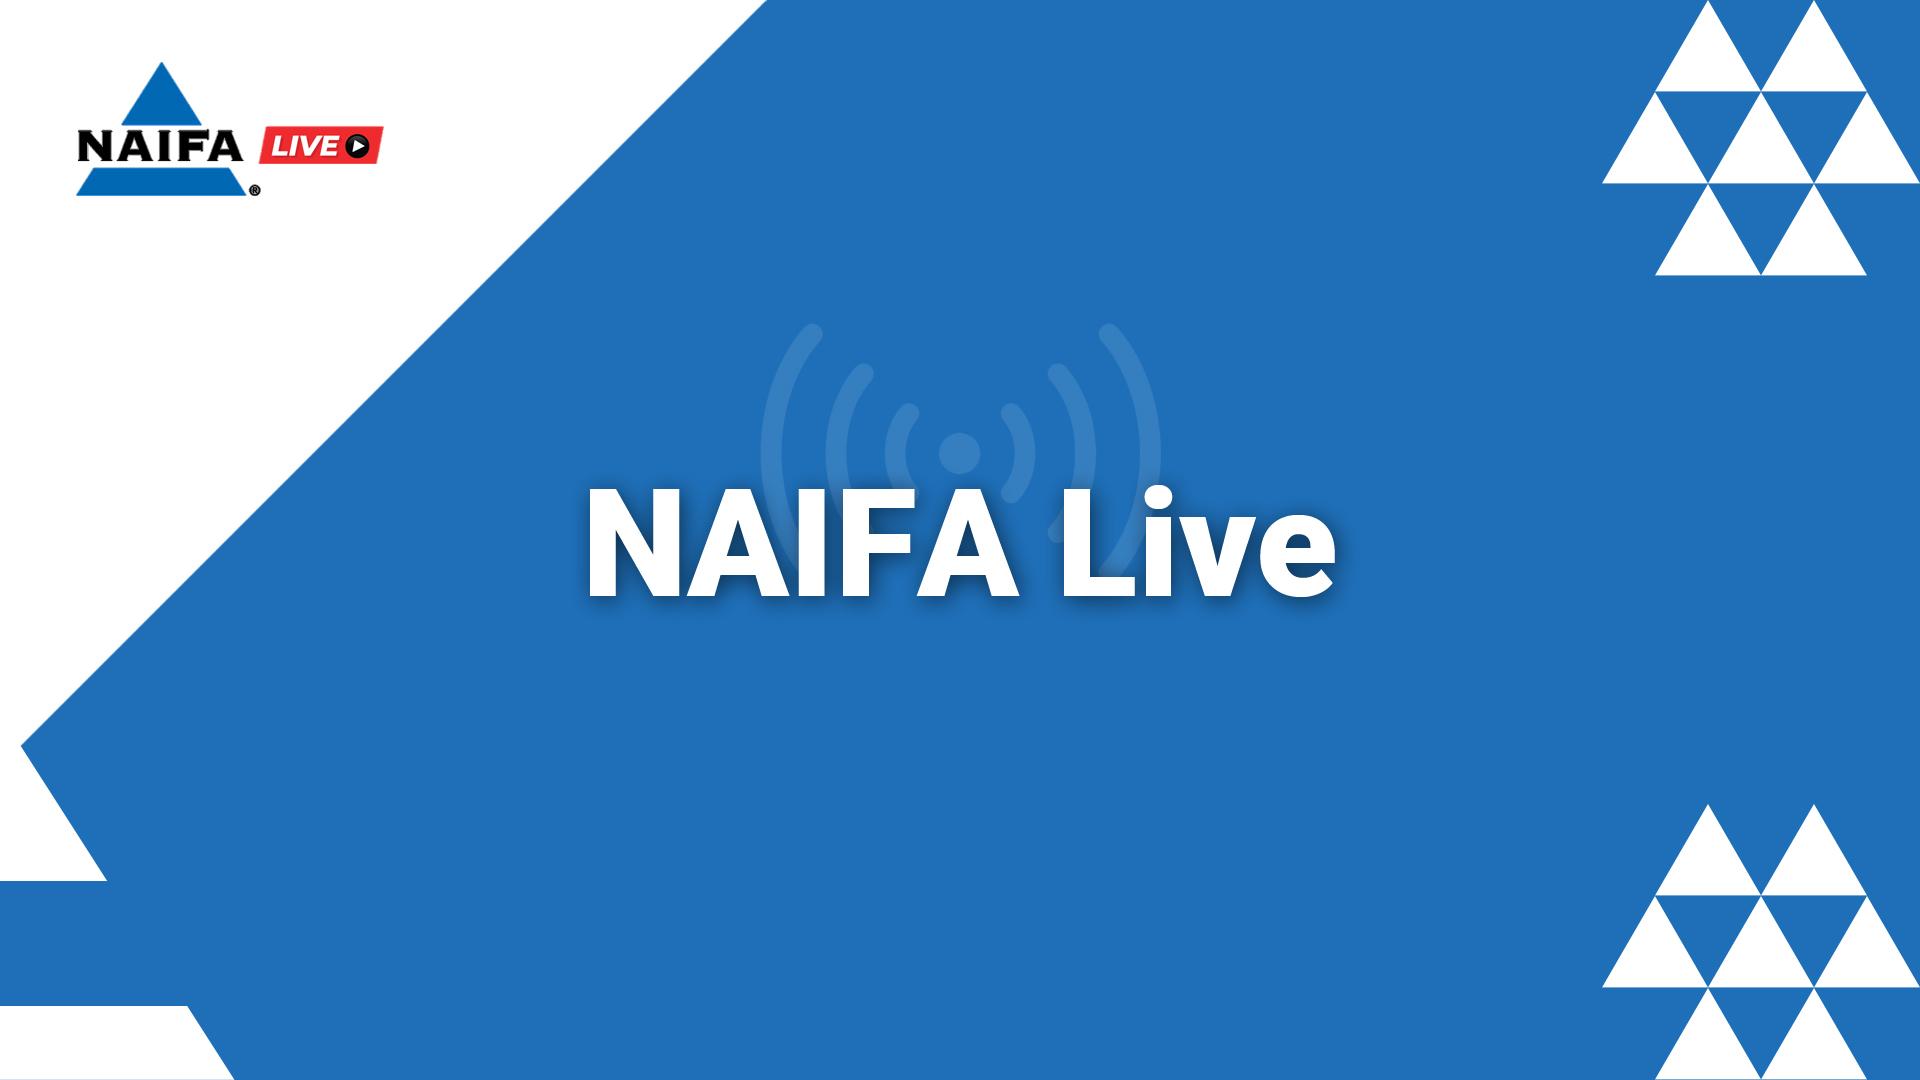 NAIFA Live